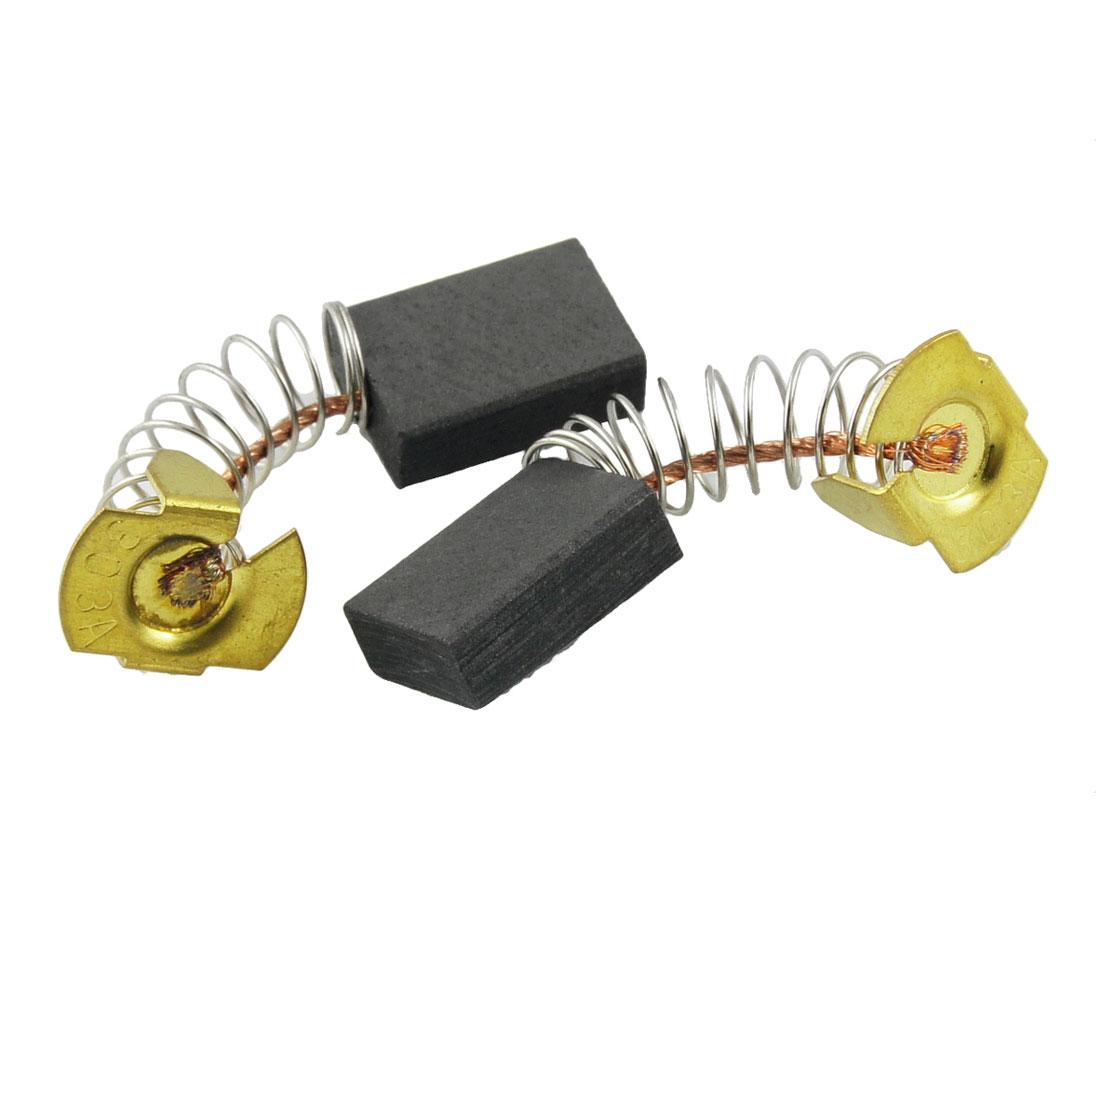 "Reparing Parts 7/16"" x 19/32"" x 1/5"" Rotary Hammer Carbon Brush 2 Pcs"